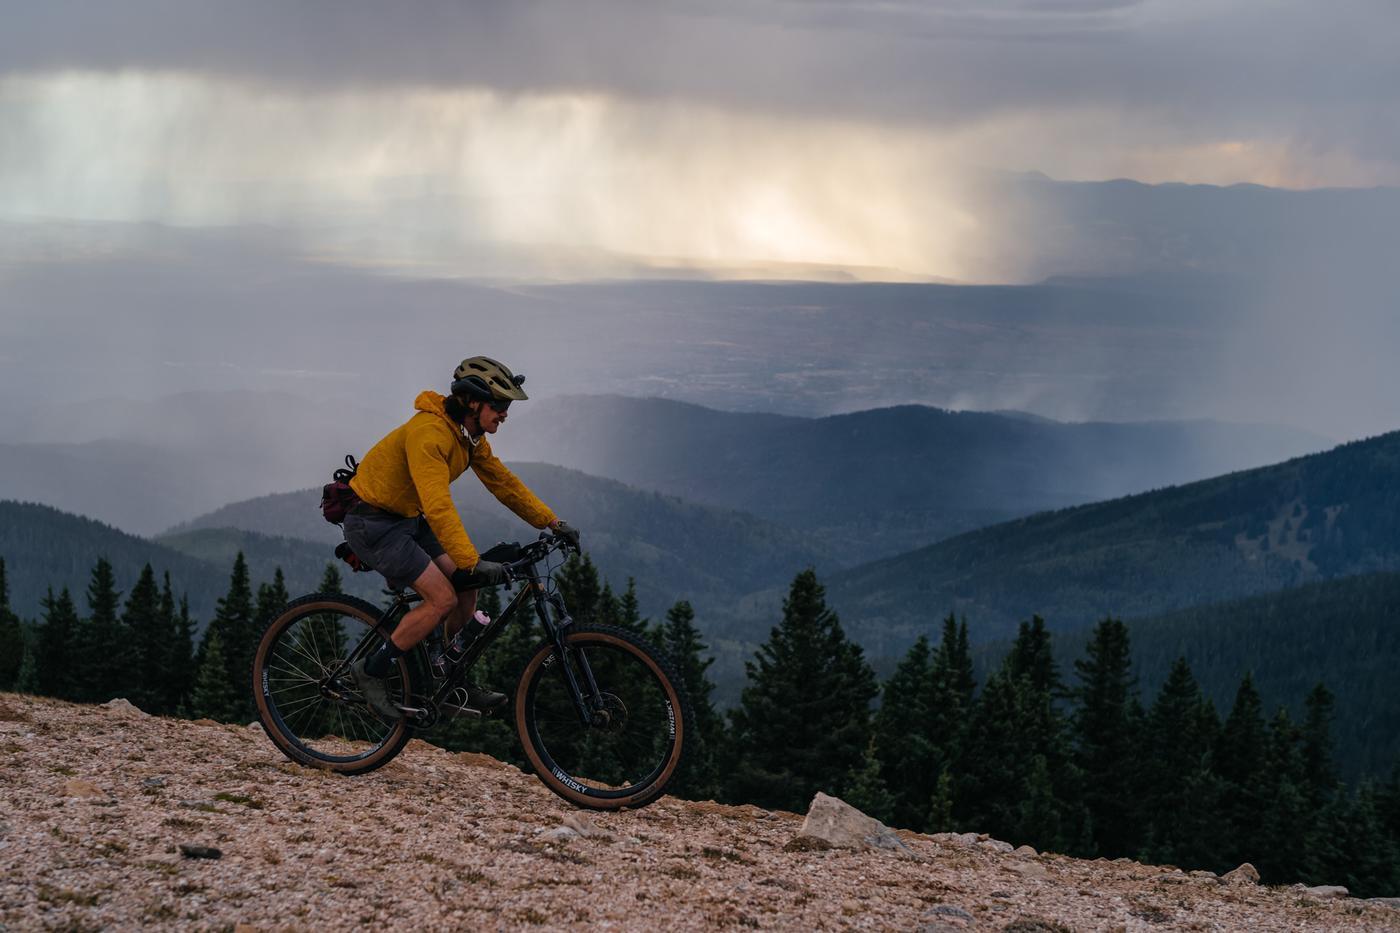 Santa Fe Rides: Take a Friend On Up to Deception Peak and Raven's Ridge